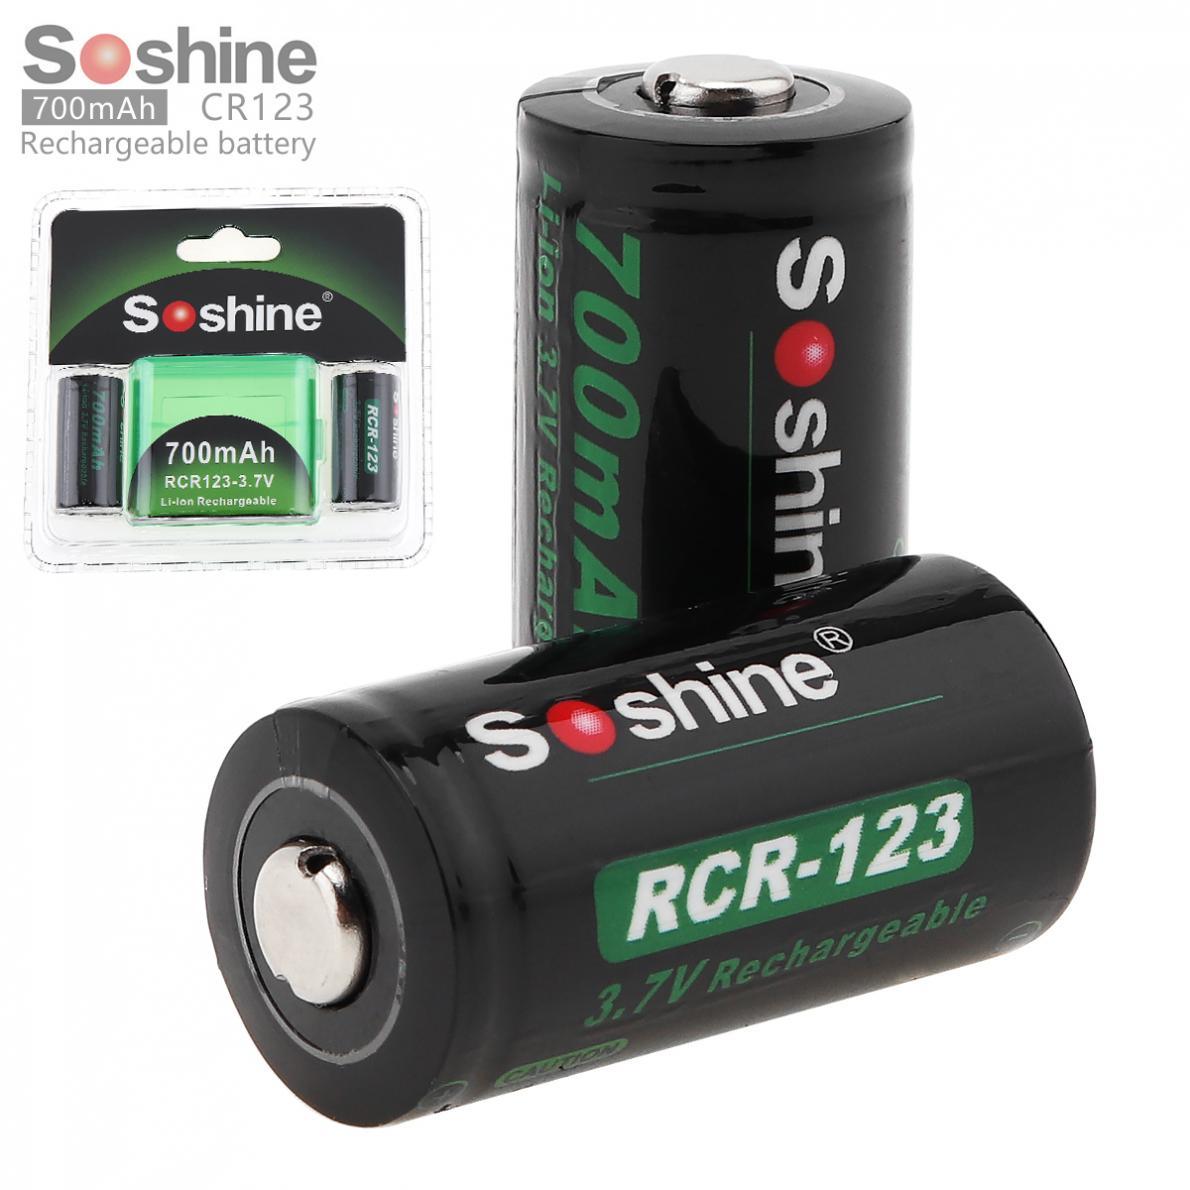 4pcs/set Soshine Li-ion RCR 123 16340 700mAh 3.7V Rechargeable Lithium Li-ion battria+2 Battery Case Storage Box soshine rechargeable 3 7v 1400mah 18500 li ion battery black 2 pcs